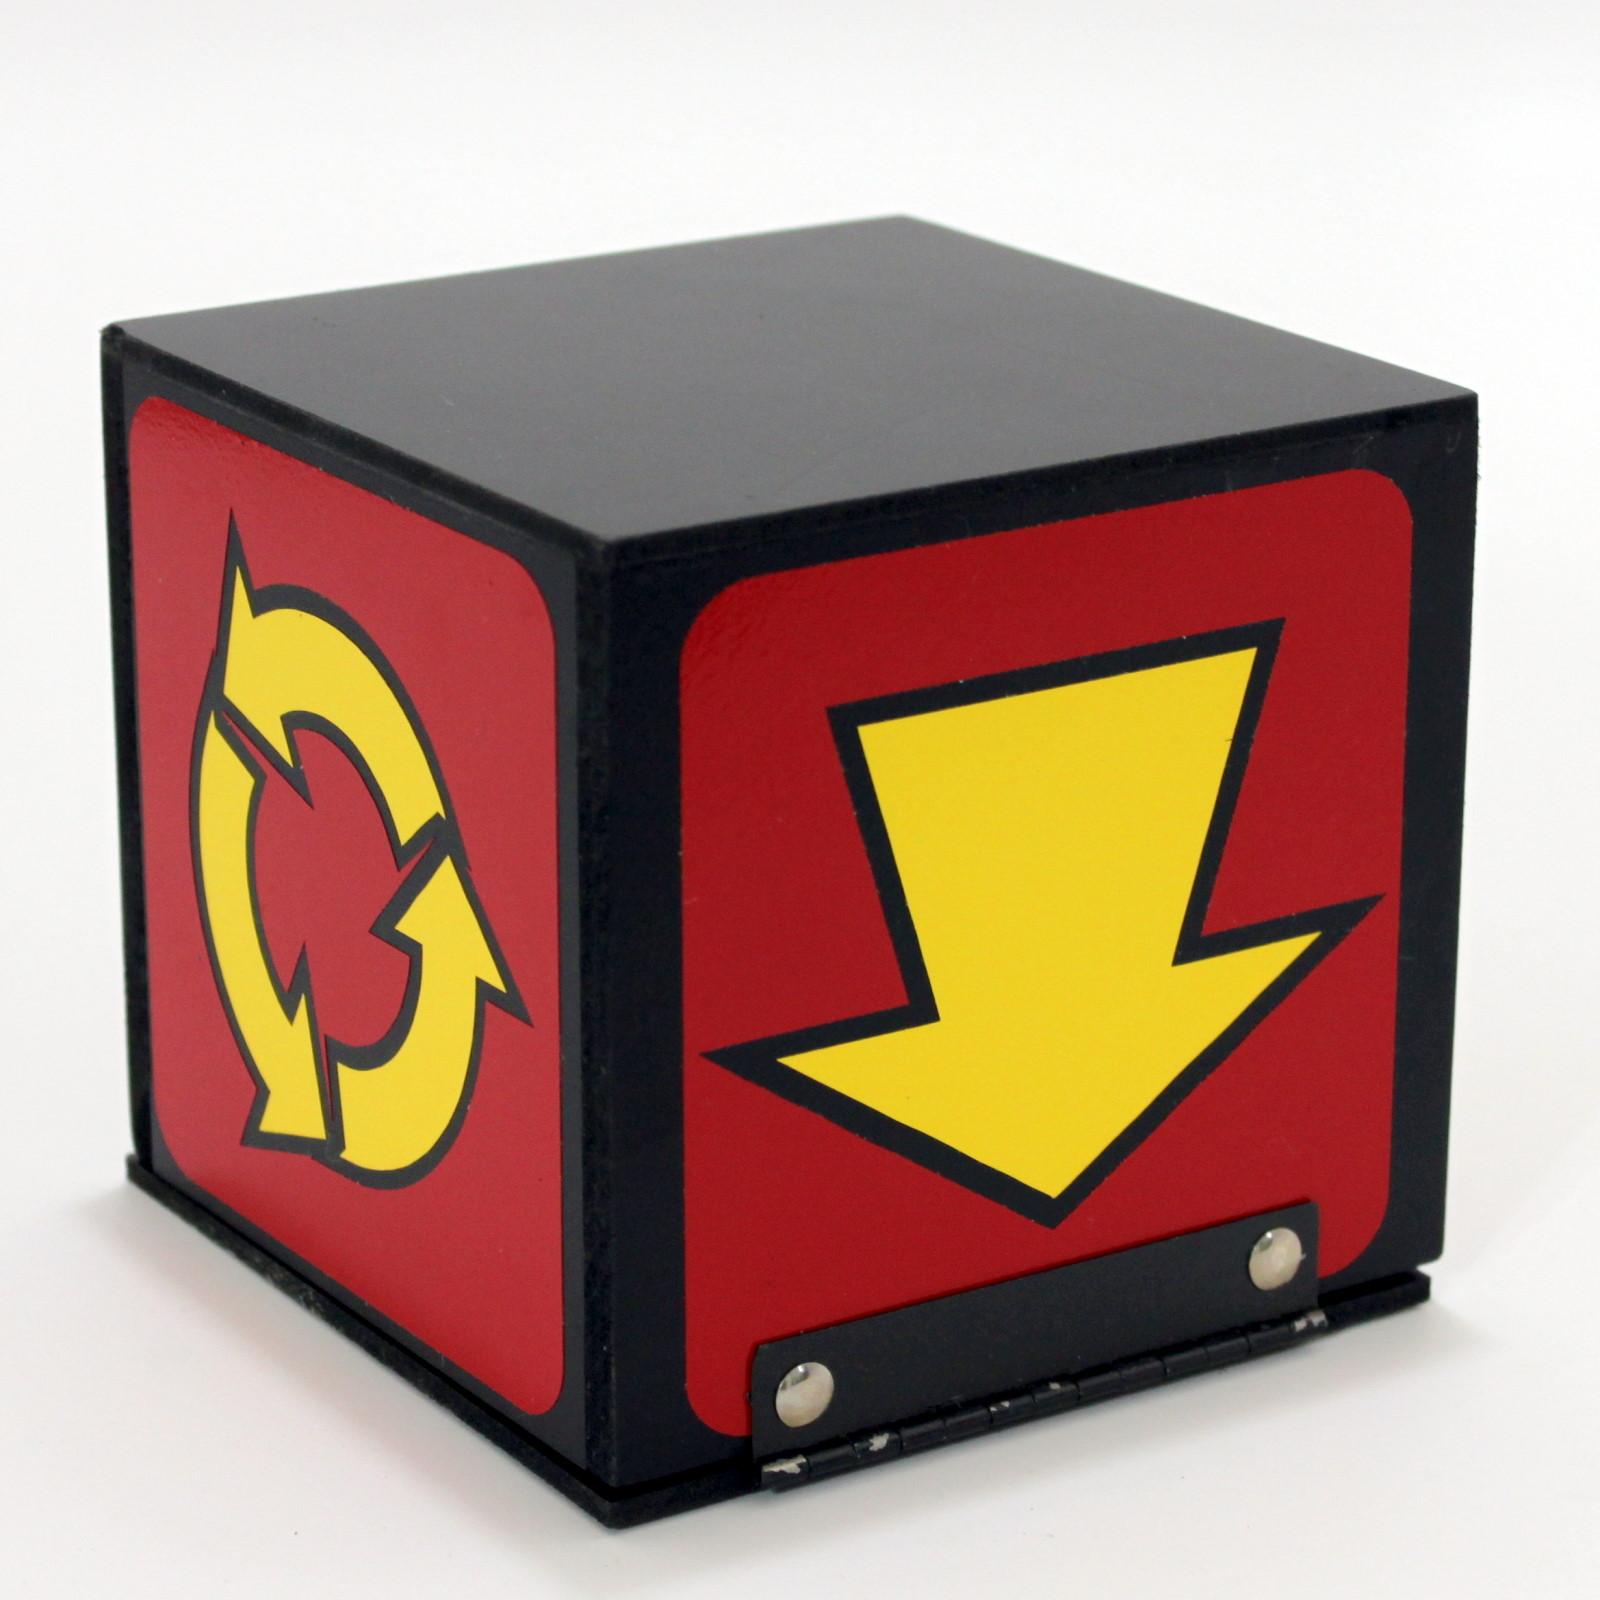 Ups and Downs Box by Greg Britt